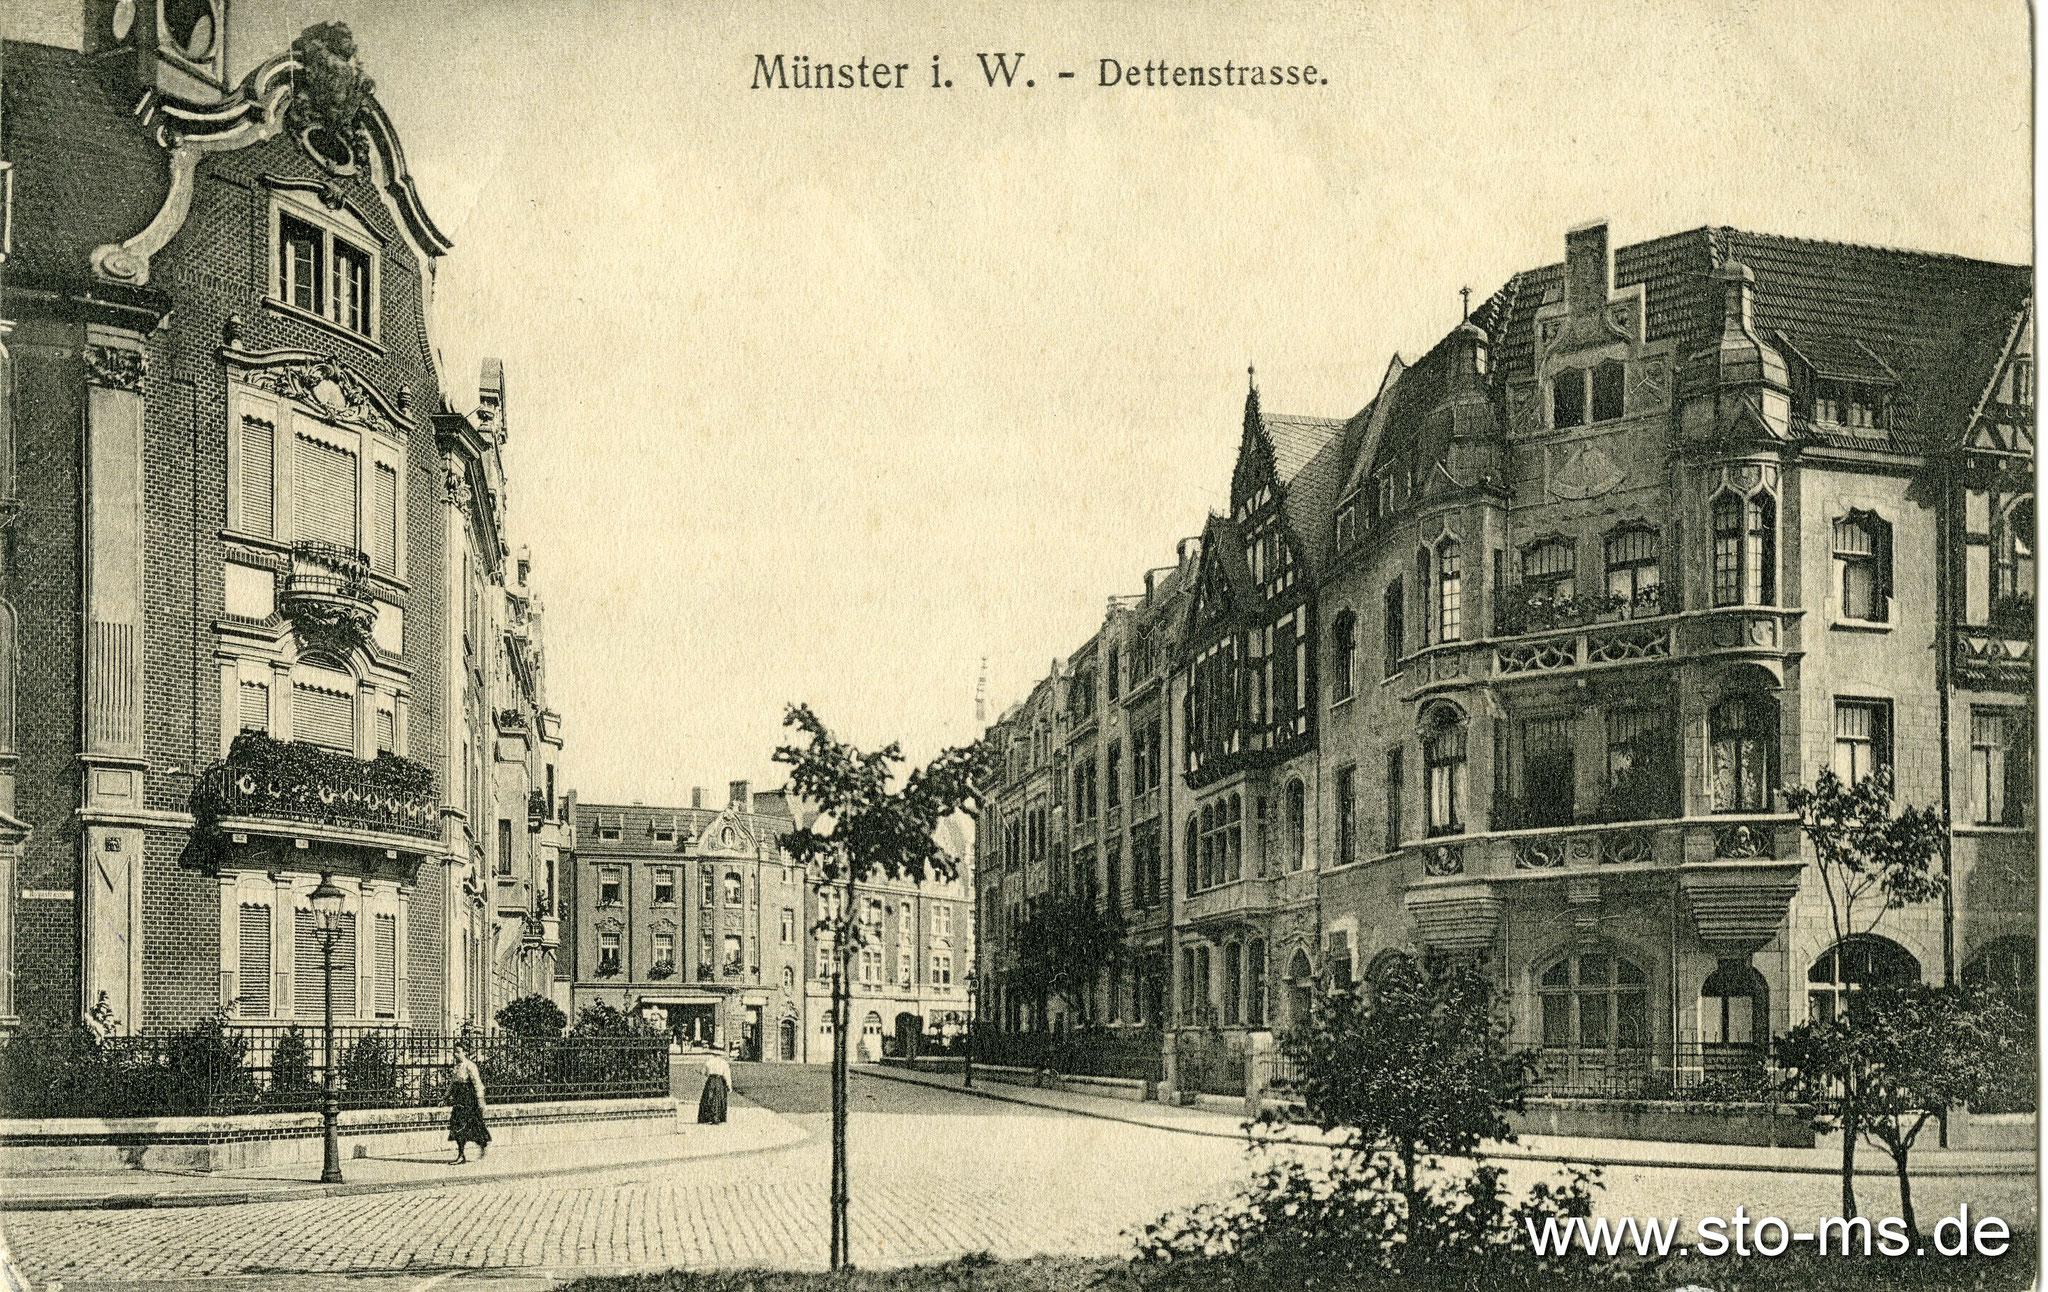 Dettenstraße